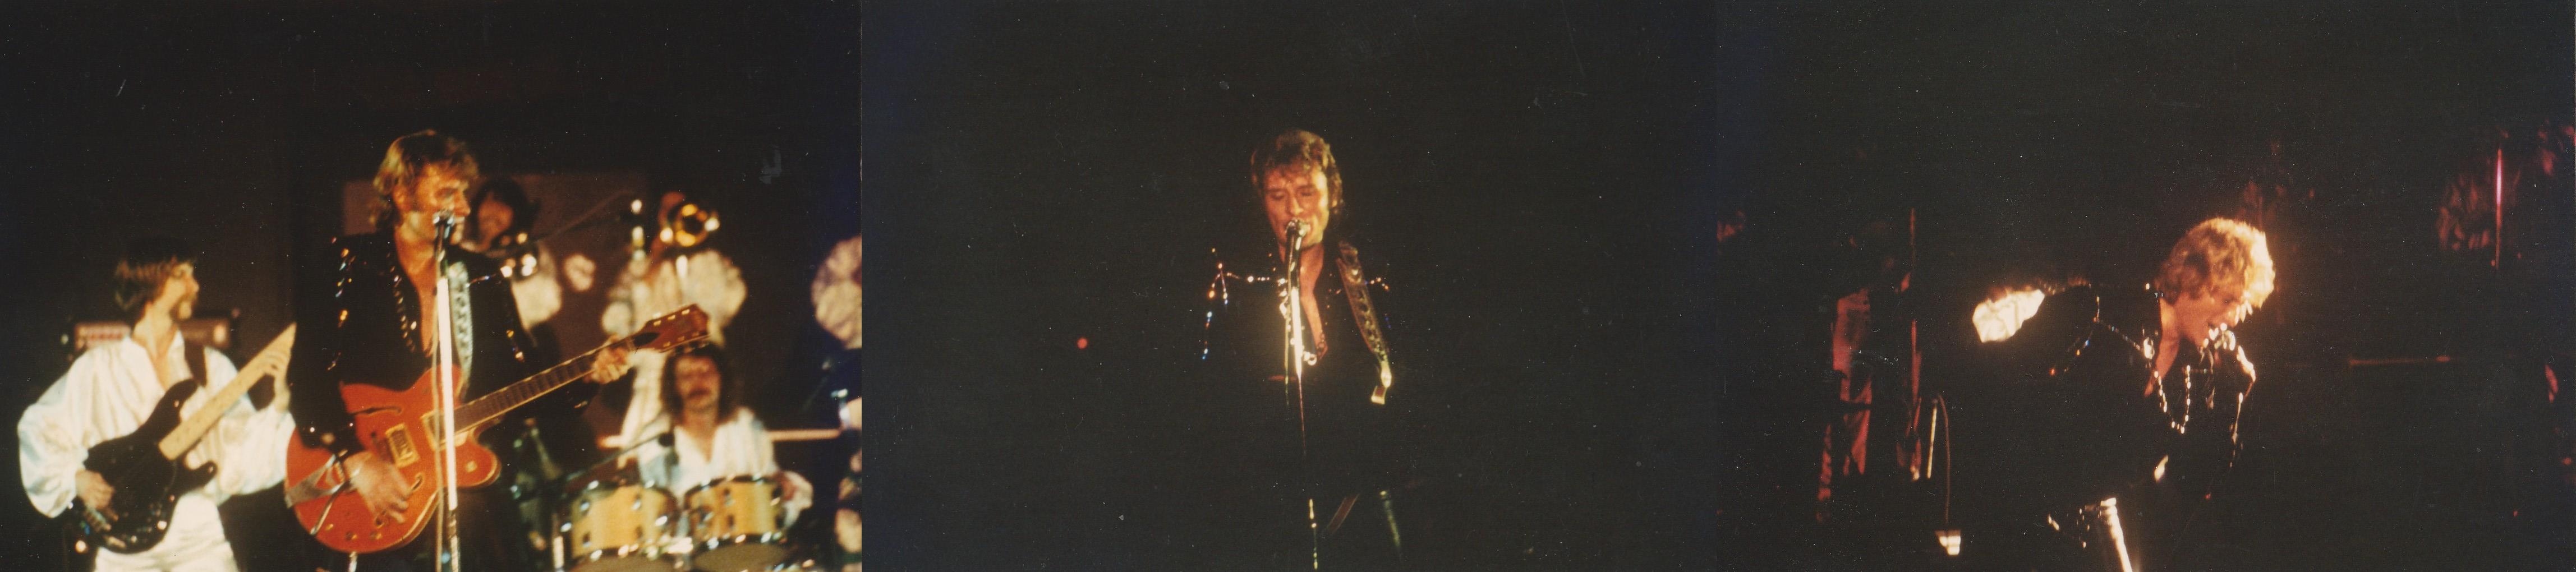 INÉDIT  :  JOHNNY HALLYDAY EN TOURNEE - HIVER 1978 -1979 ( PHOTOS INÉDITES )   0246